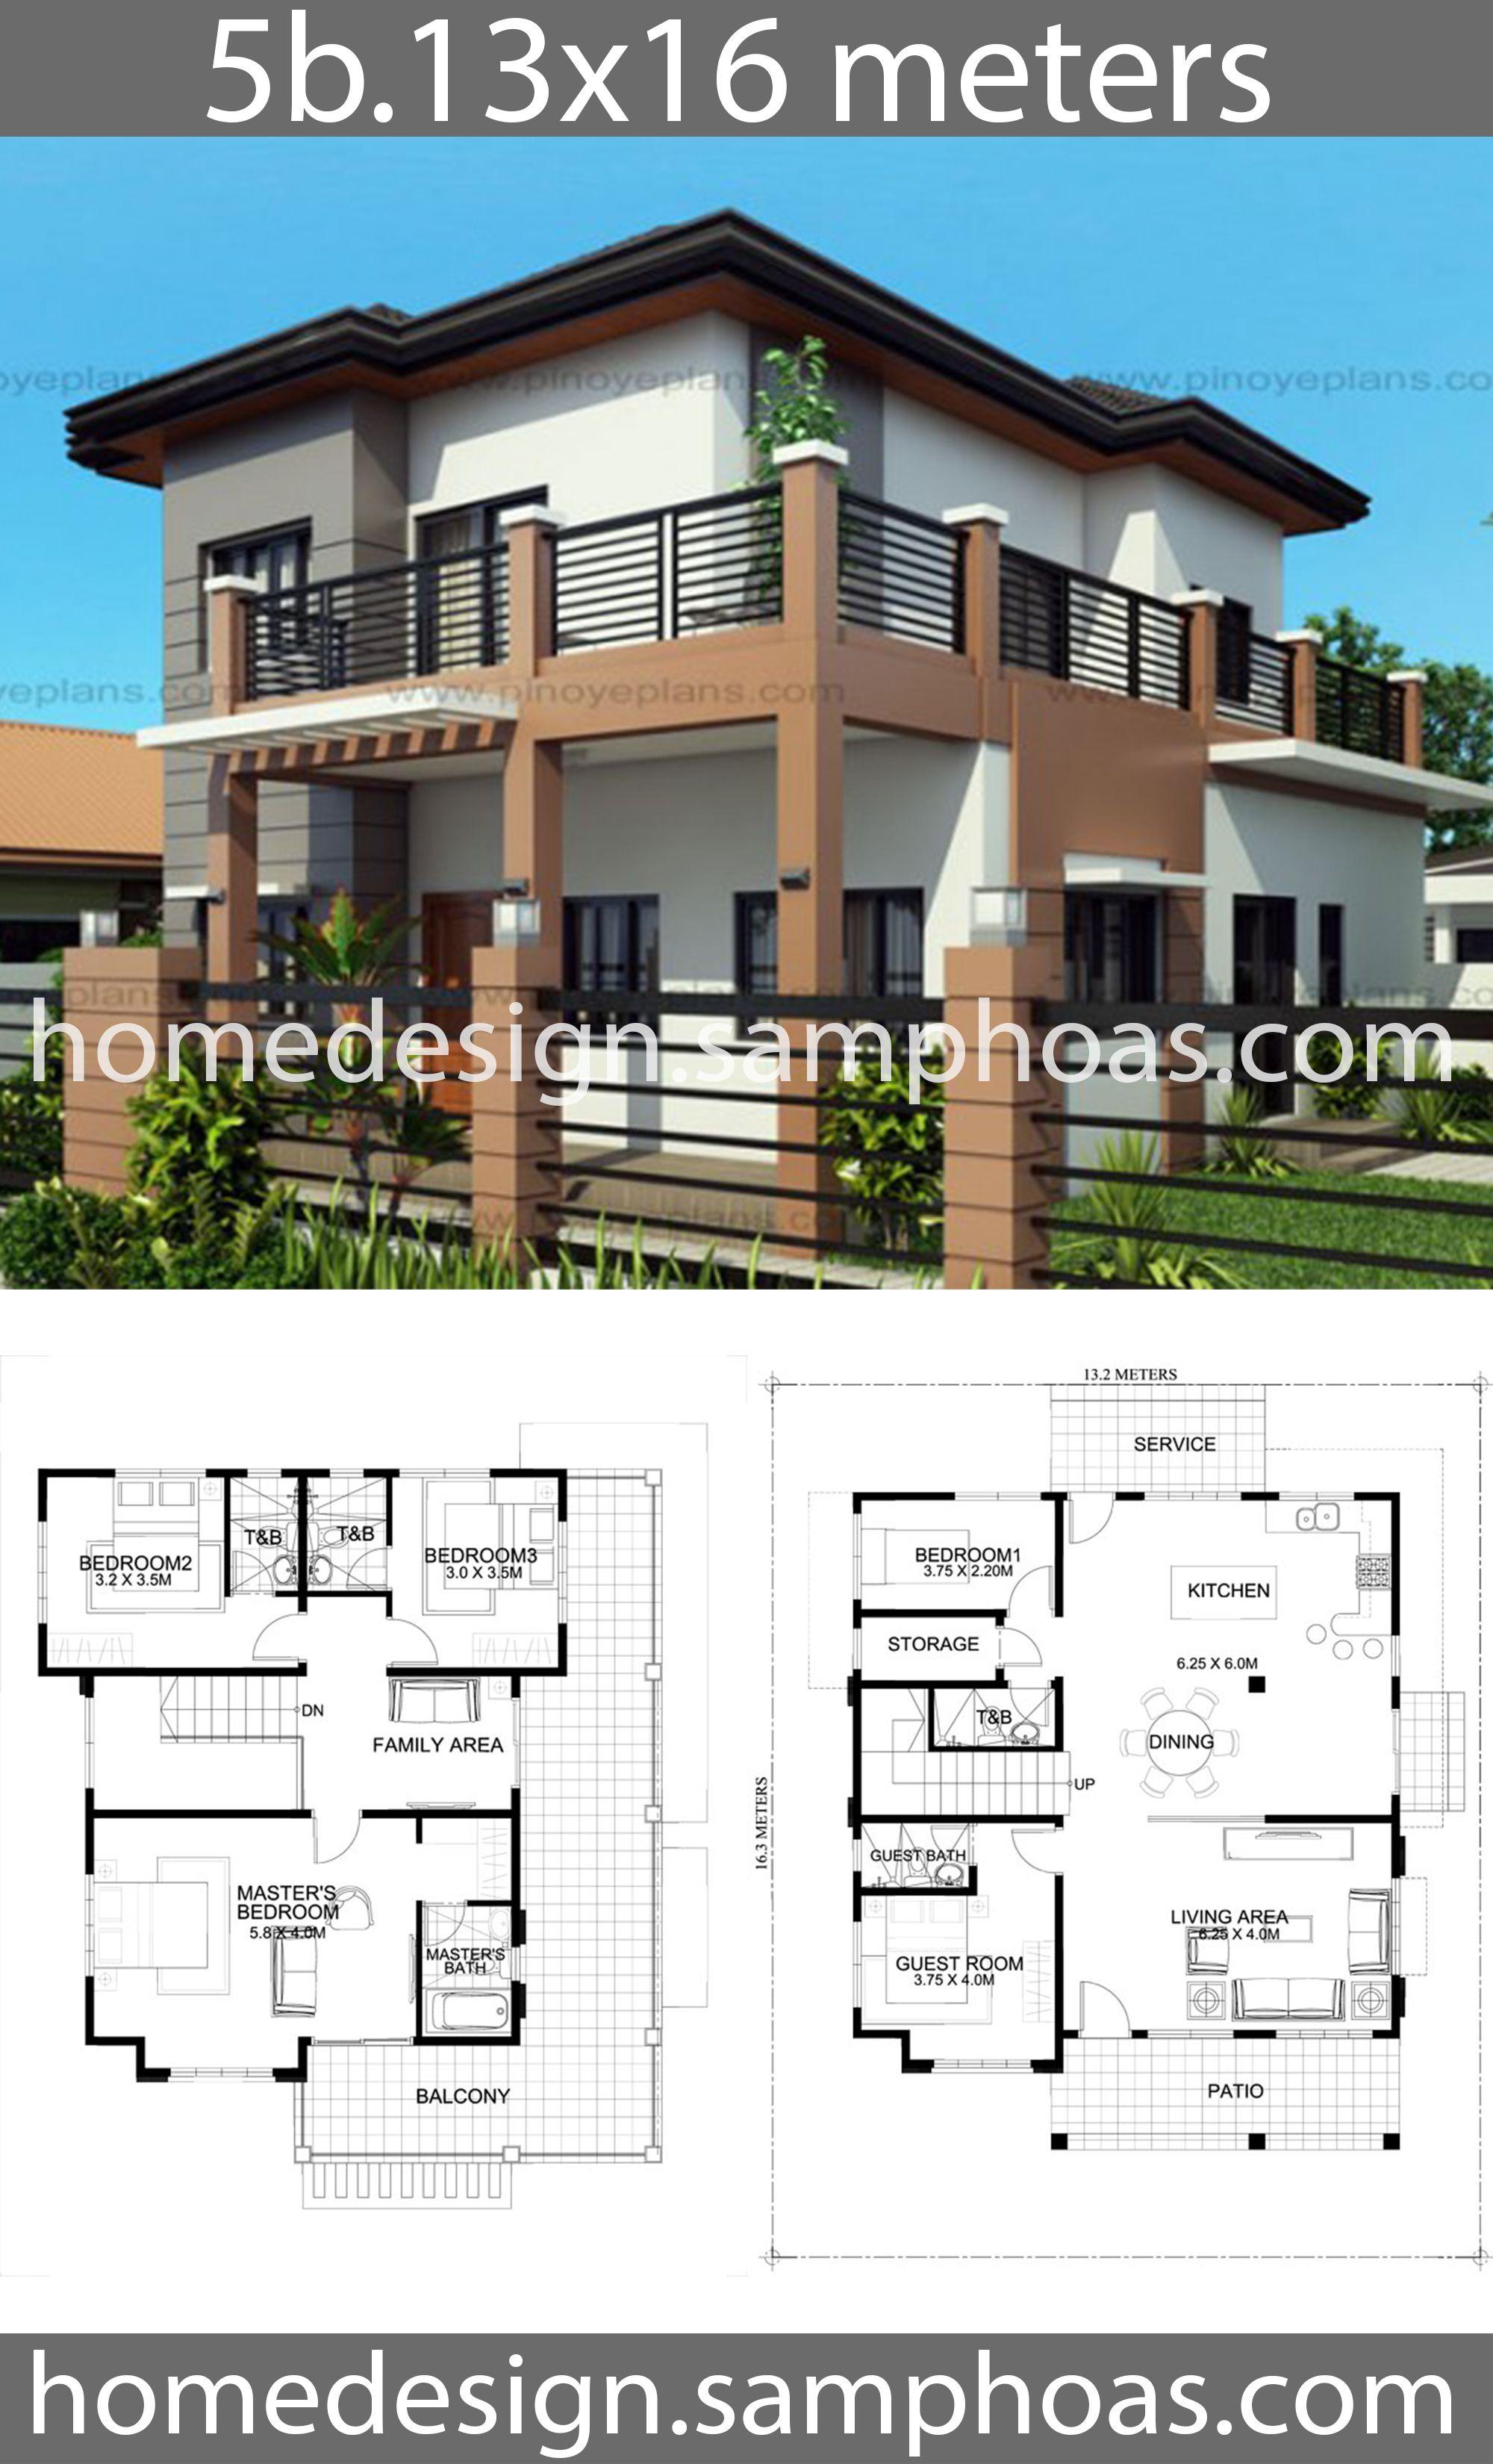 Pin By Furqon Adv On House Plans Idea Home Design Plans House Design Two Story House Design